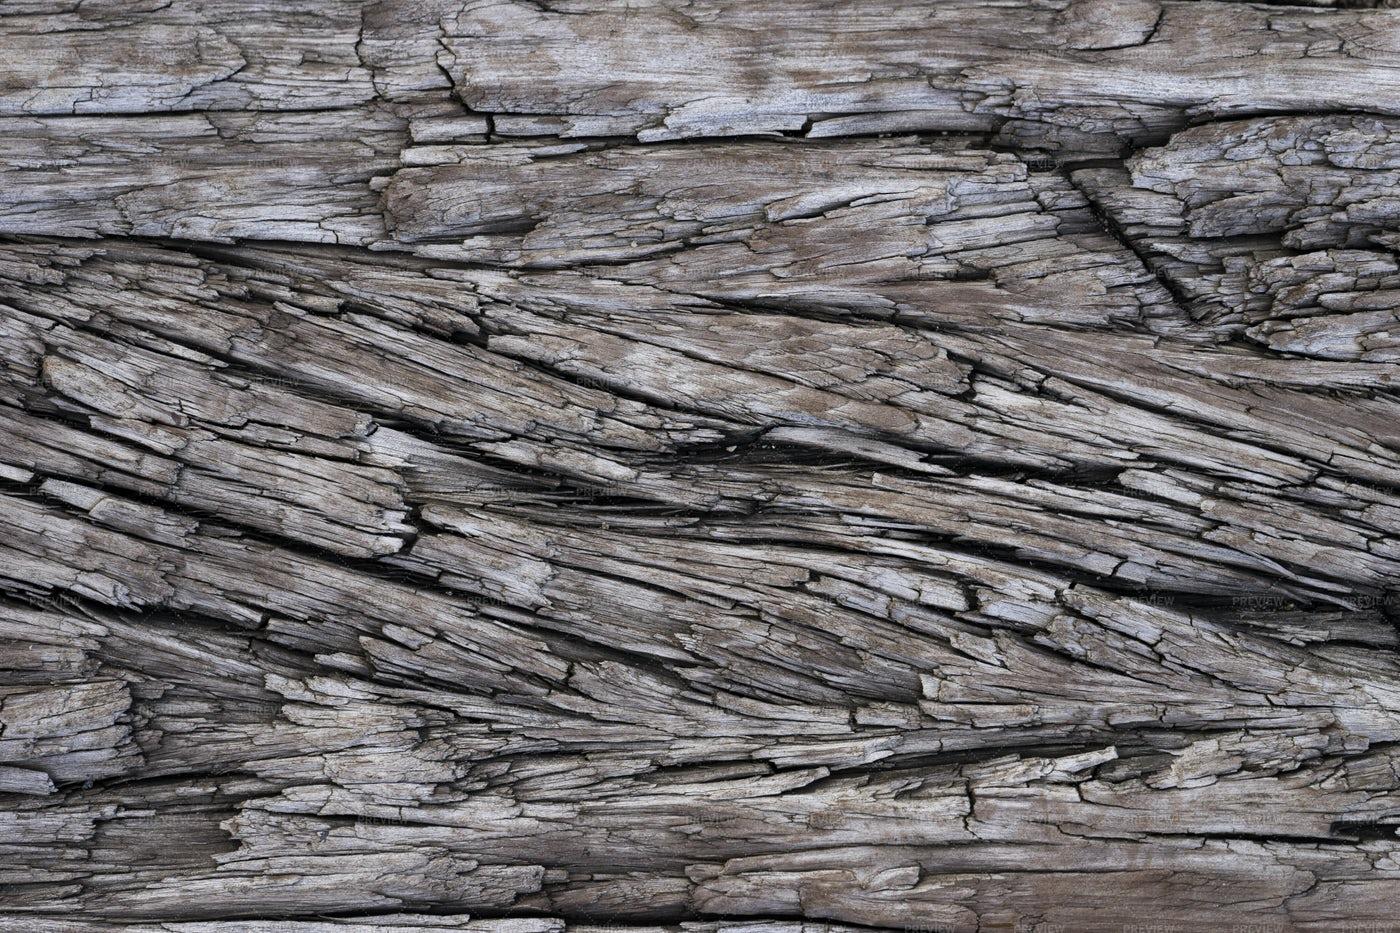 Old Tree Trunk Textures: Stock Photos